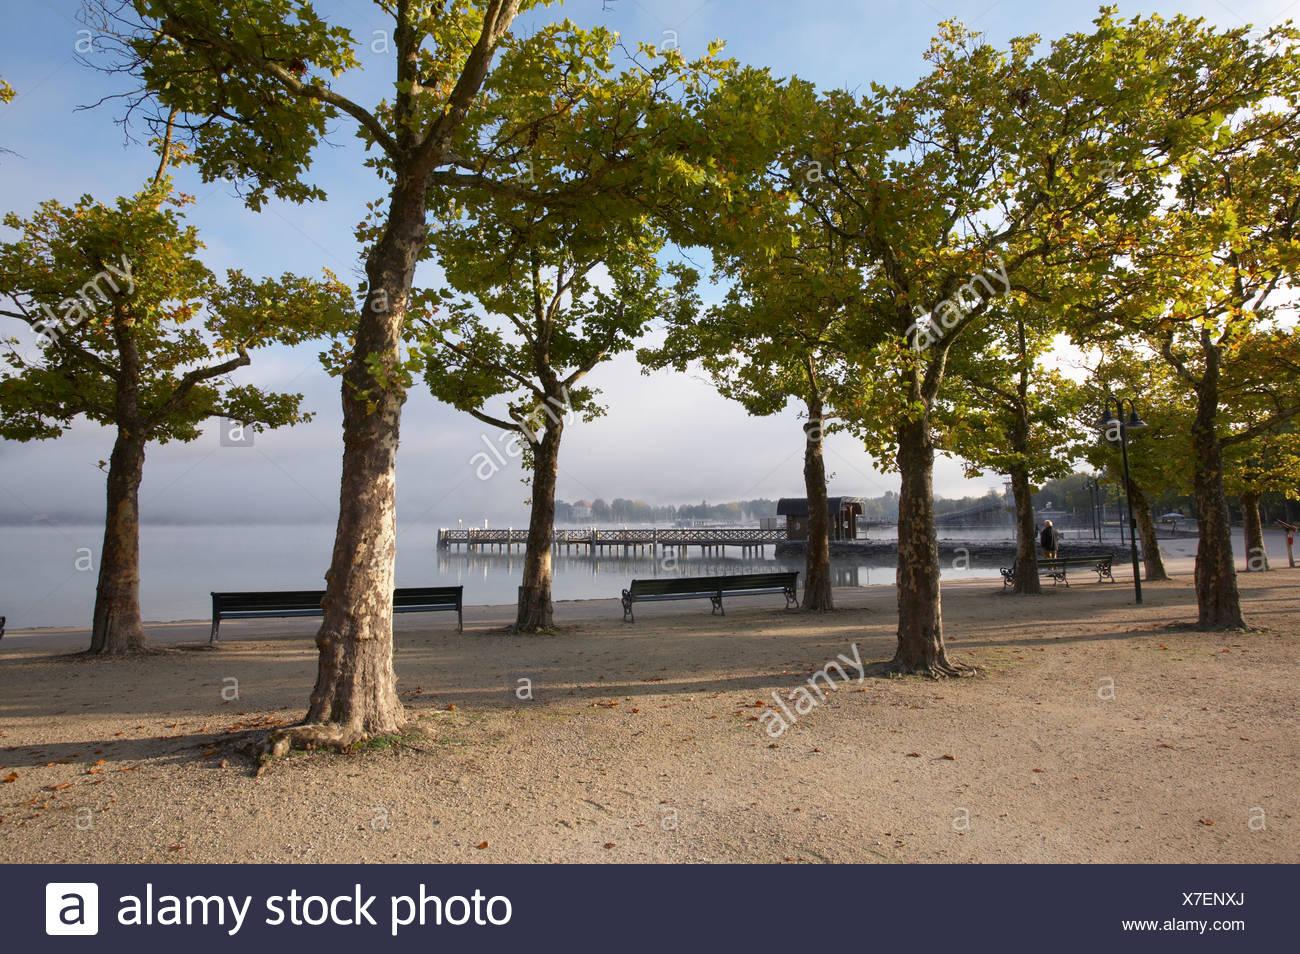 Trees at Woerthersee lake near Klagenfurt, Carinthia, Austria Stock Photo